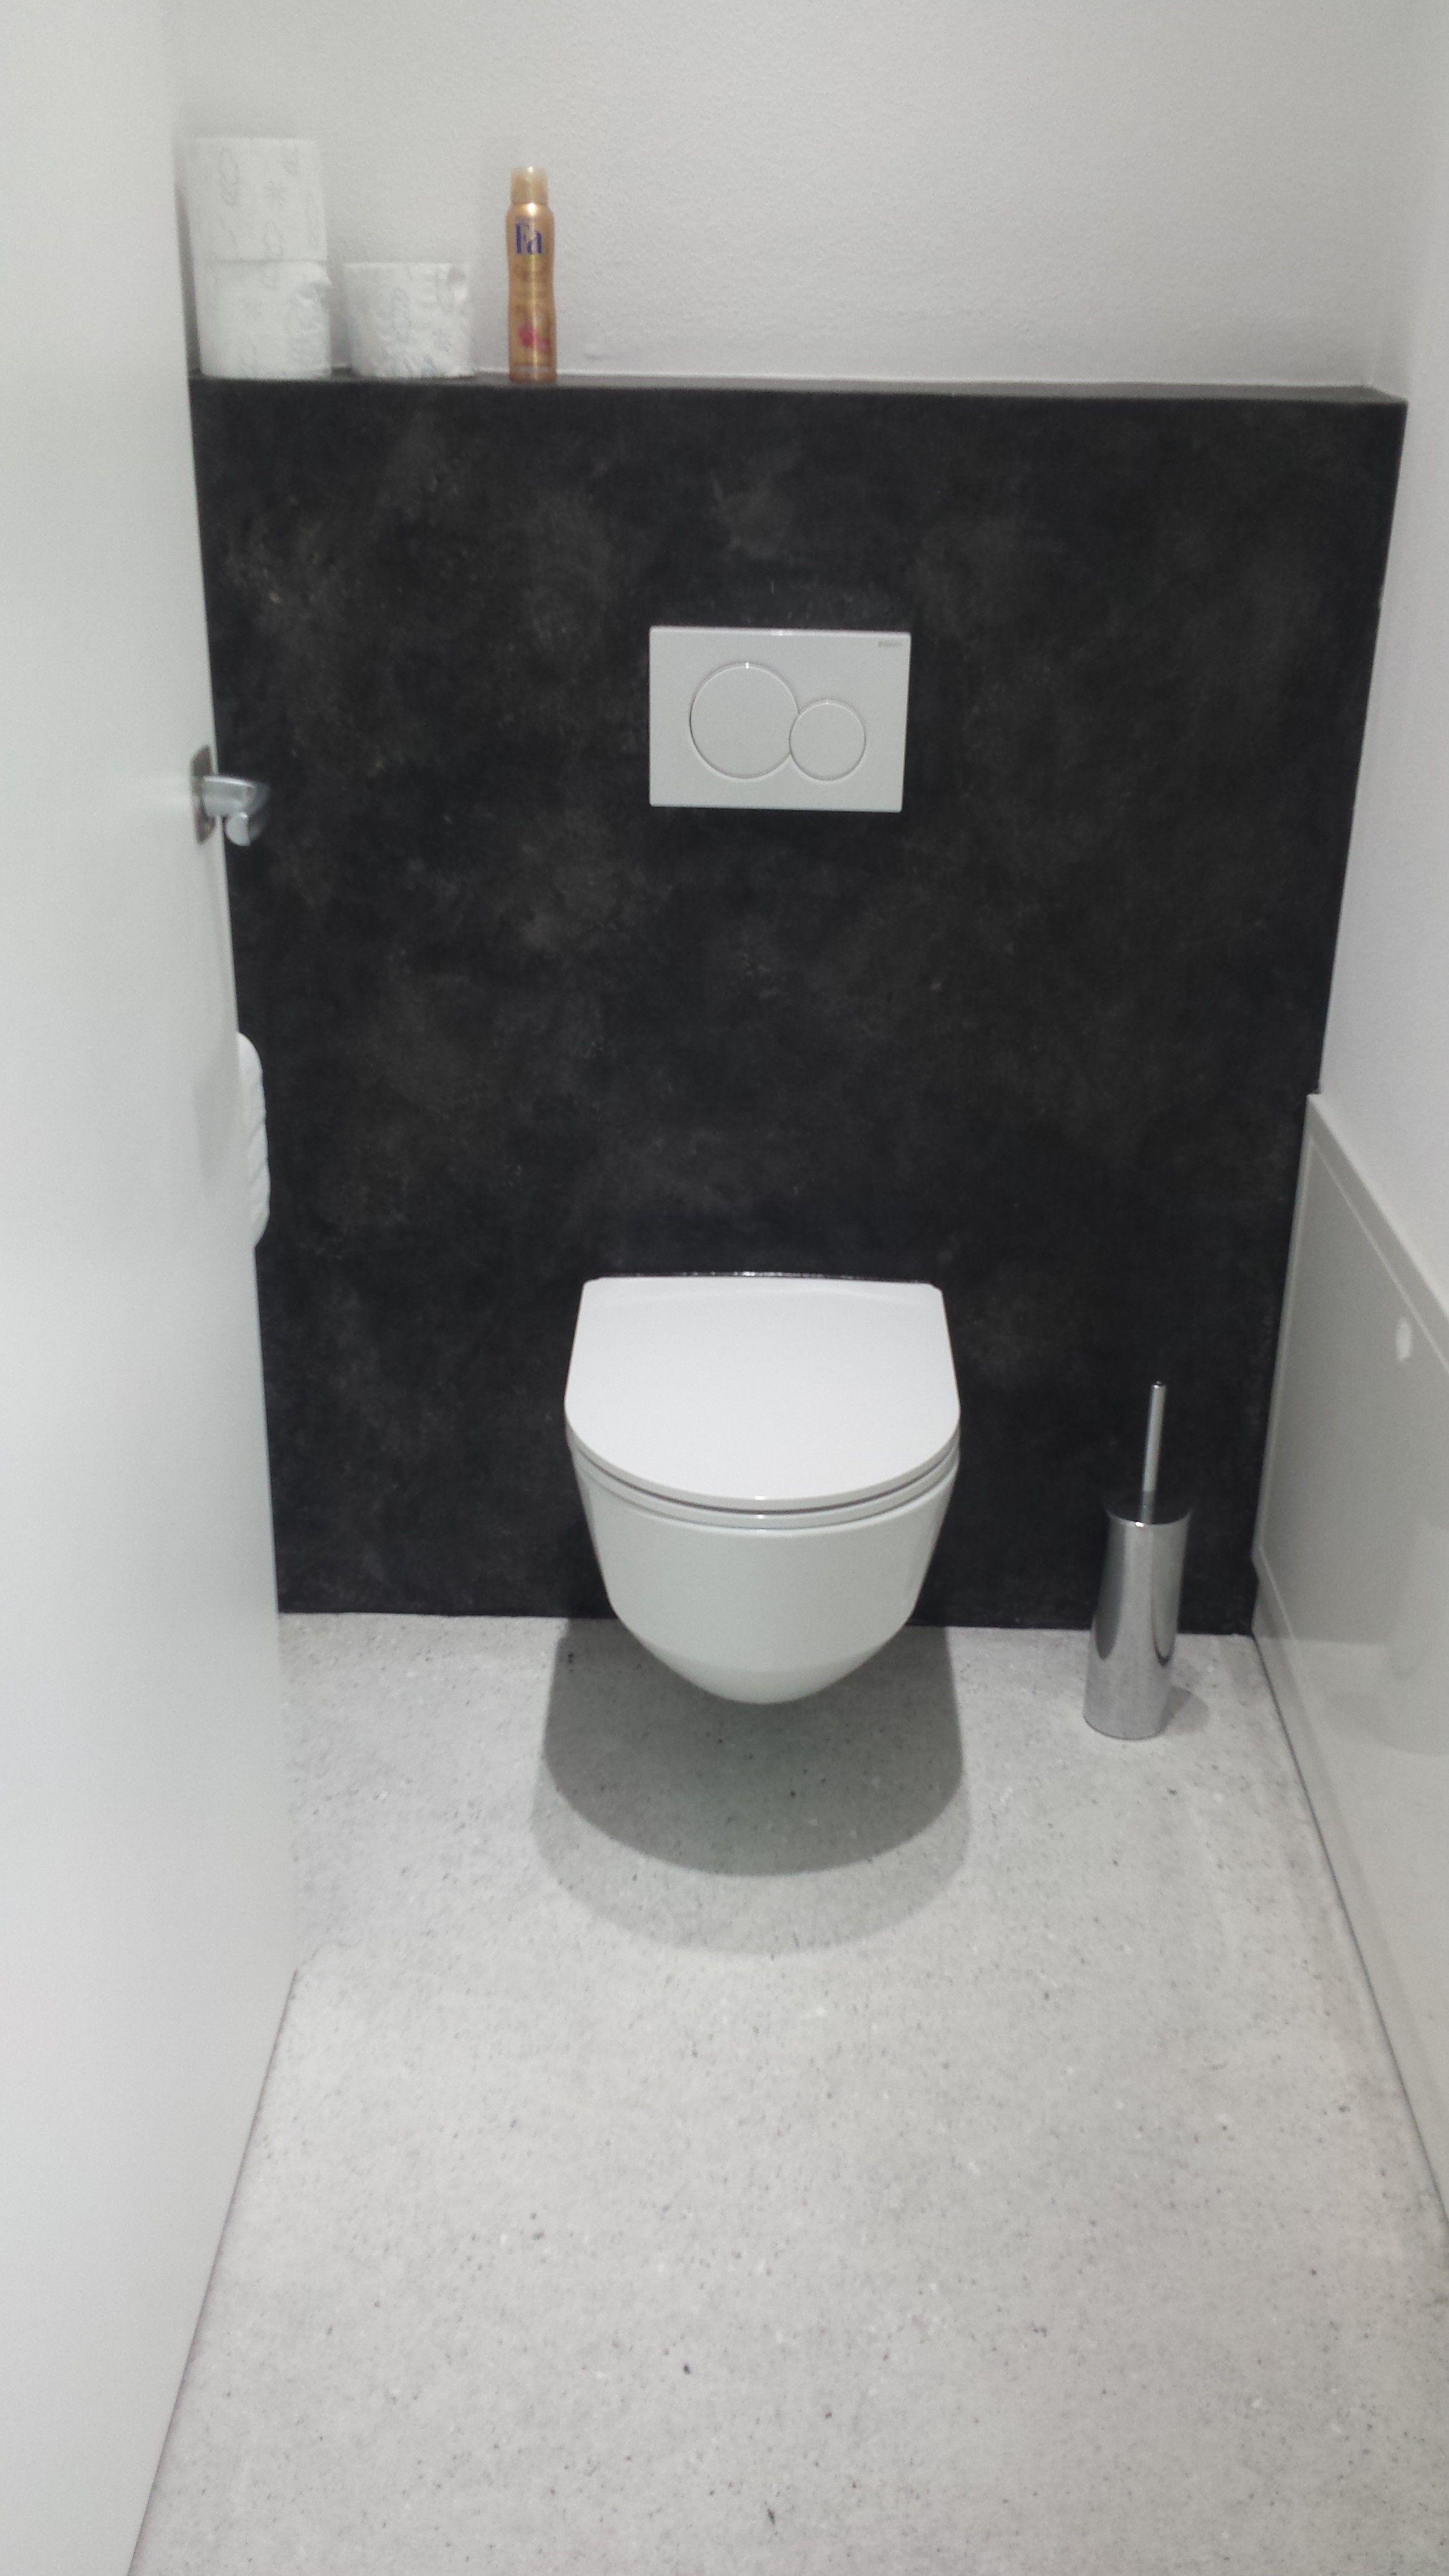 Granit Effekt Wand Und Boden Design Stedfloor Markenboden Wandgestaltung Bodenbeschichtung Wand